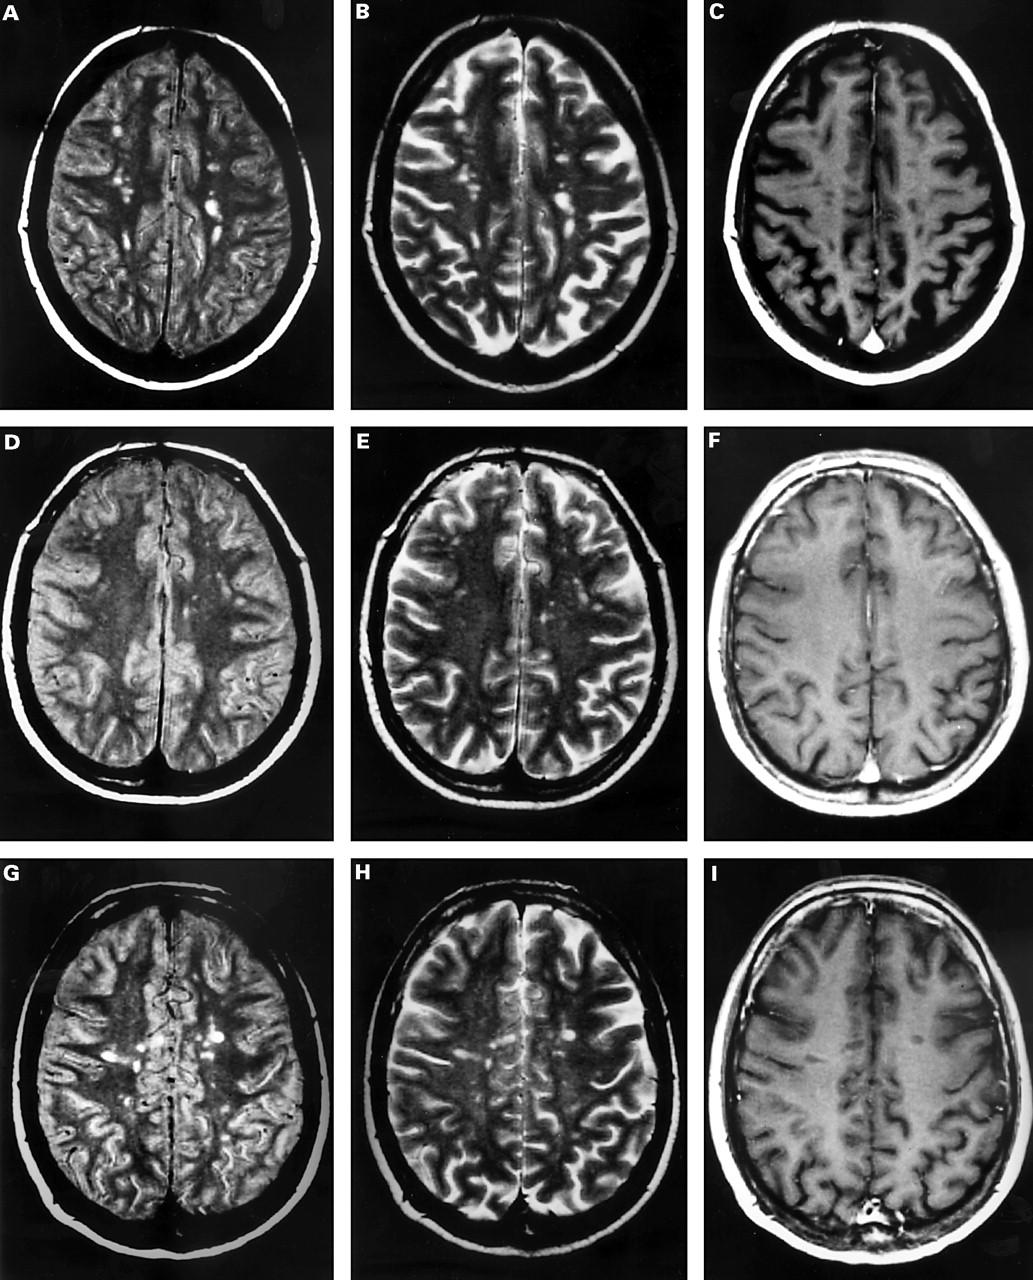 Brain involvement in systemic immune mediated diseases